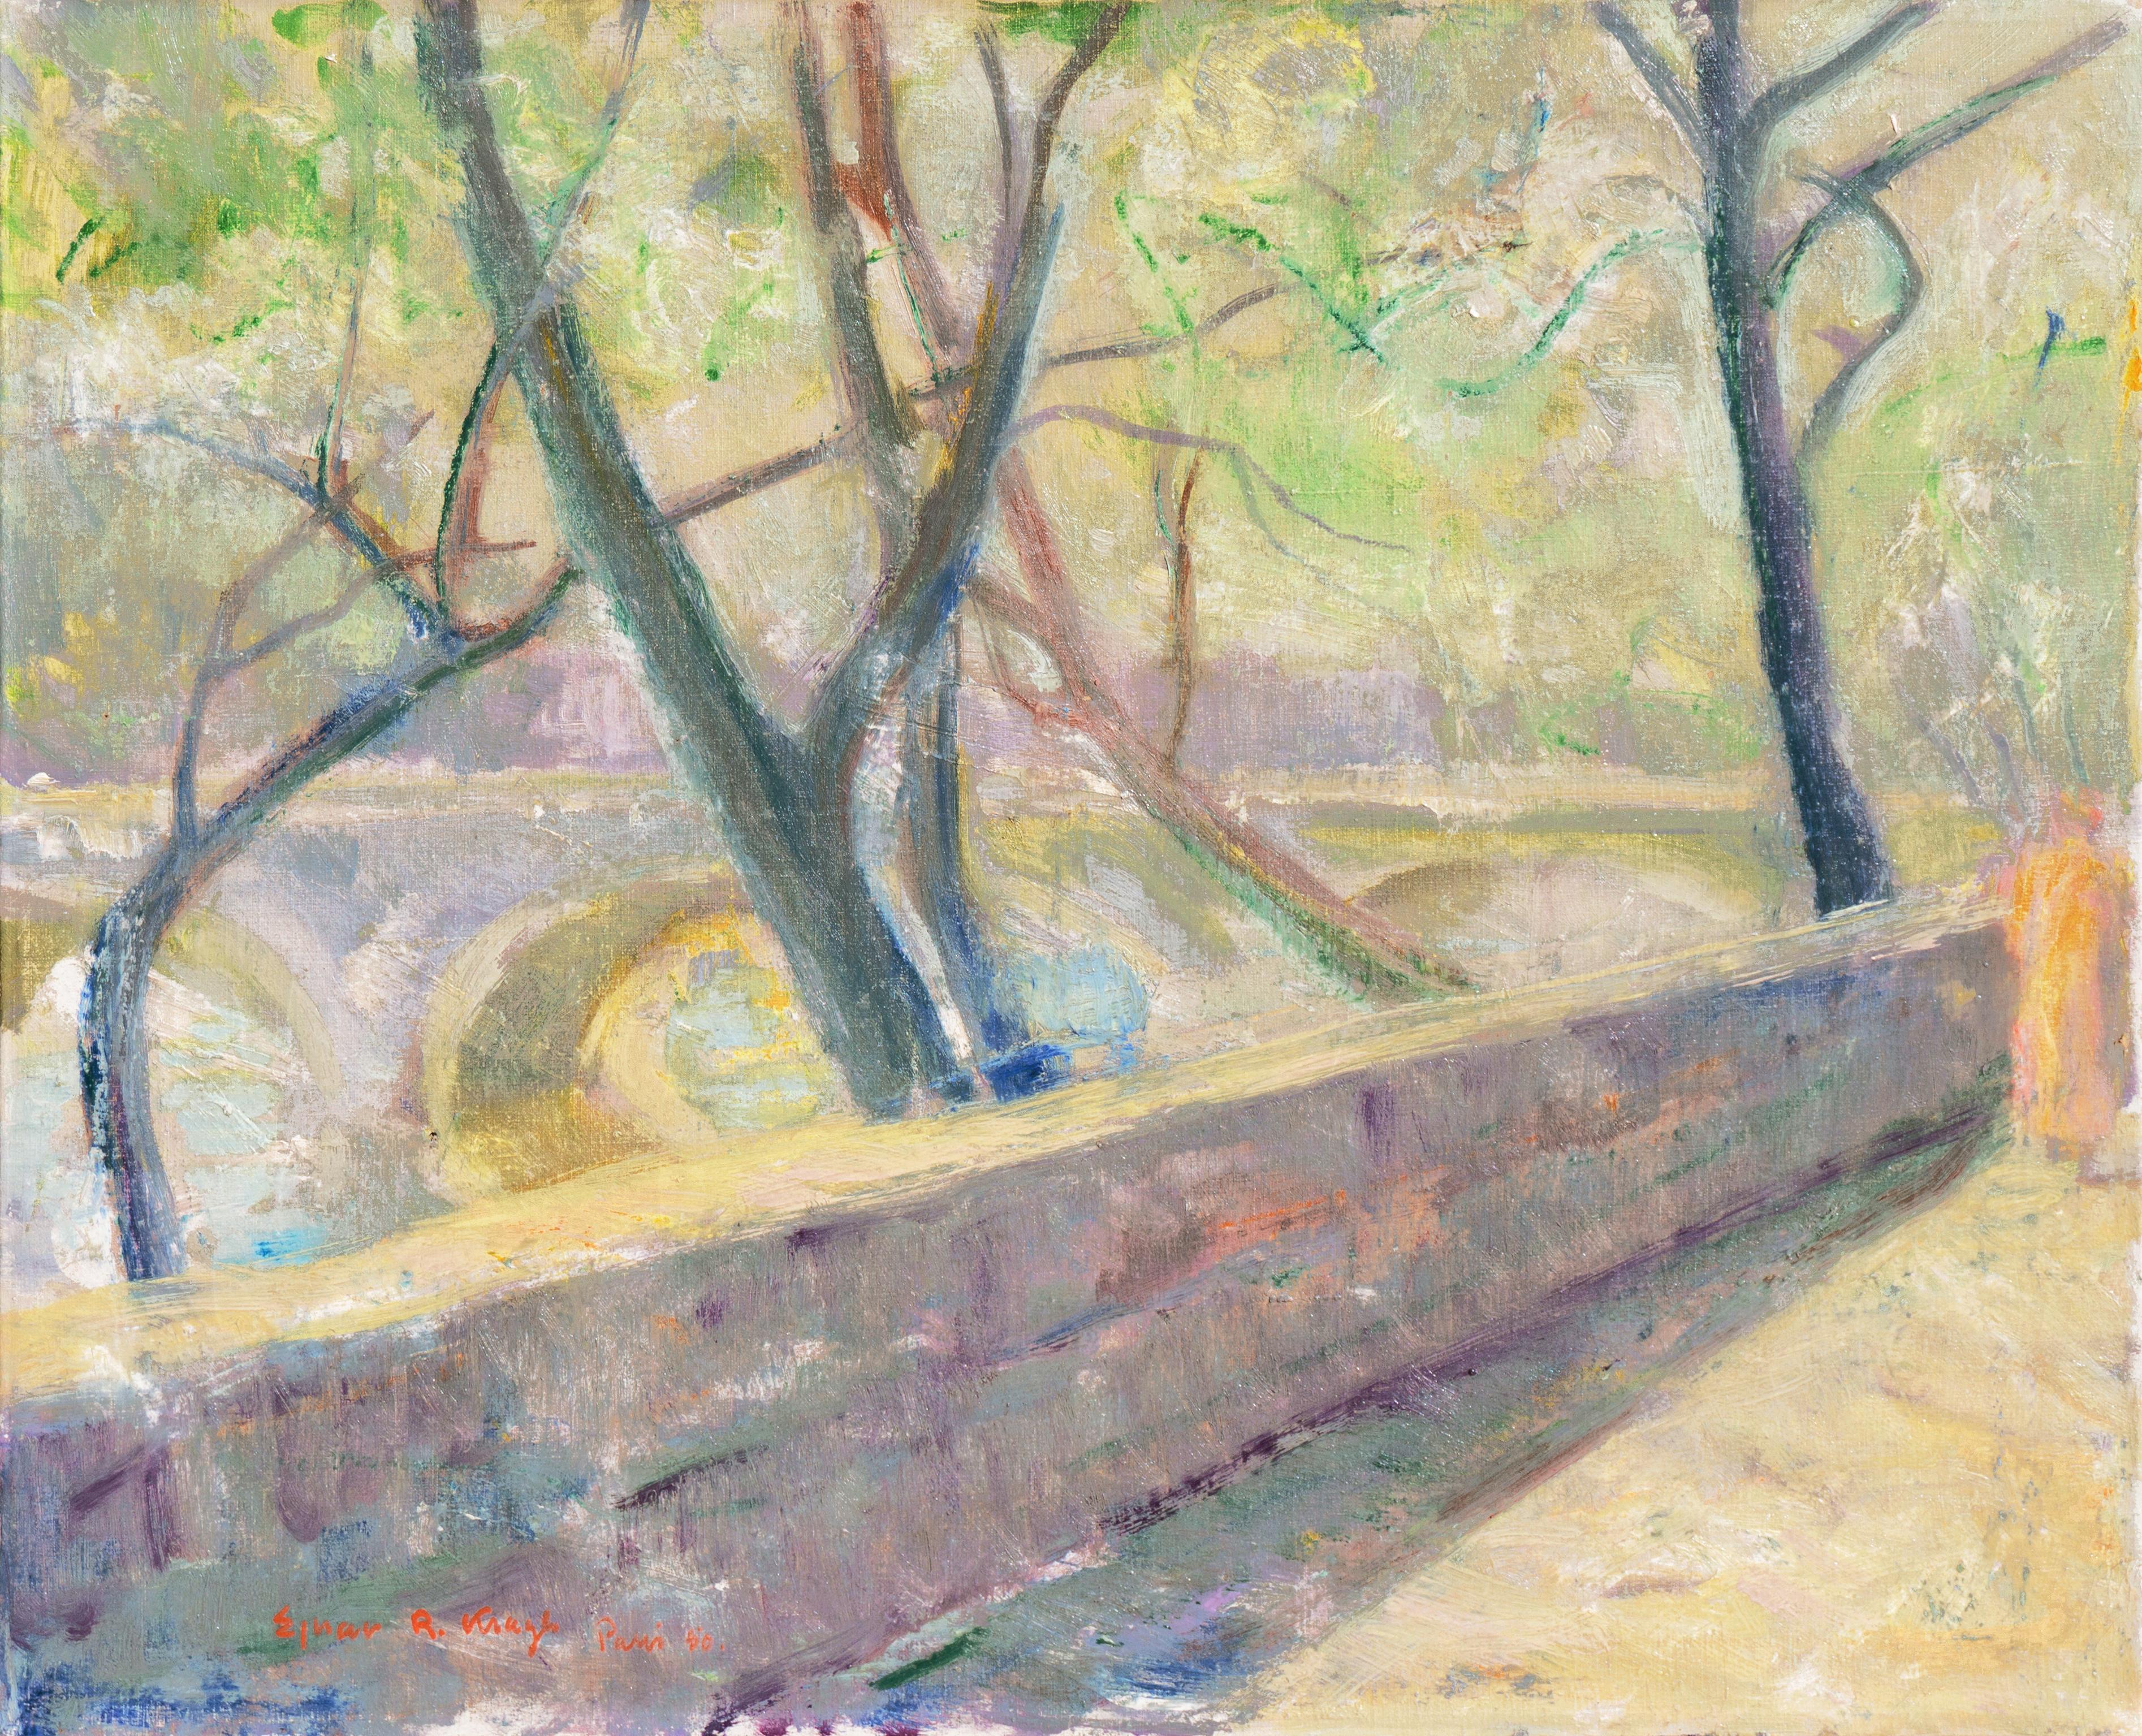 'Woman Walking Beside the Seine', Pont Neuf, Paris, French Post-Impressionist